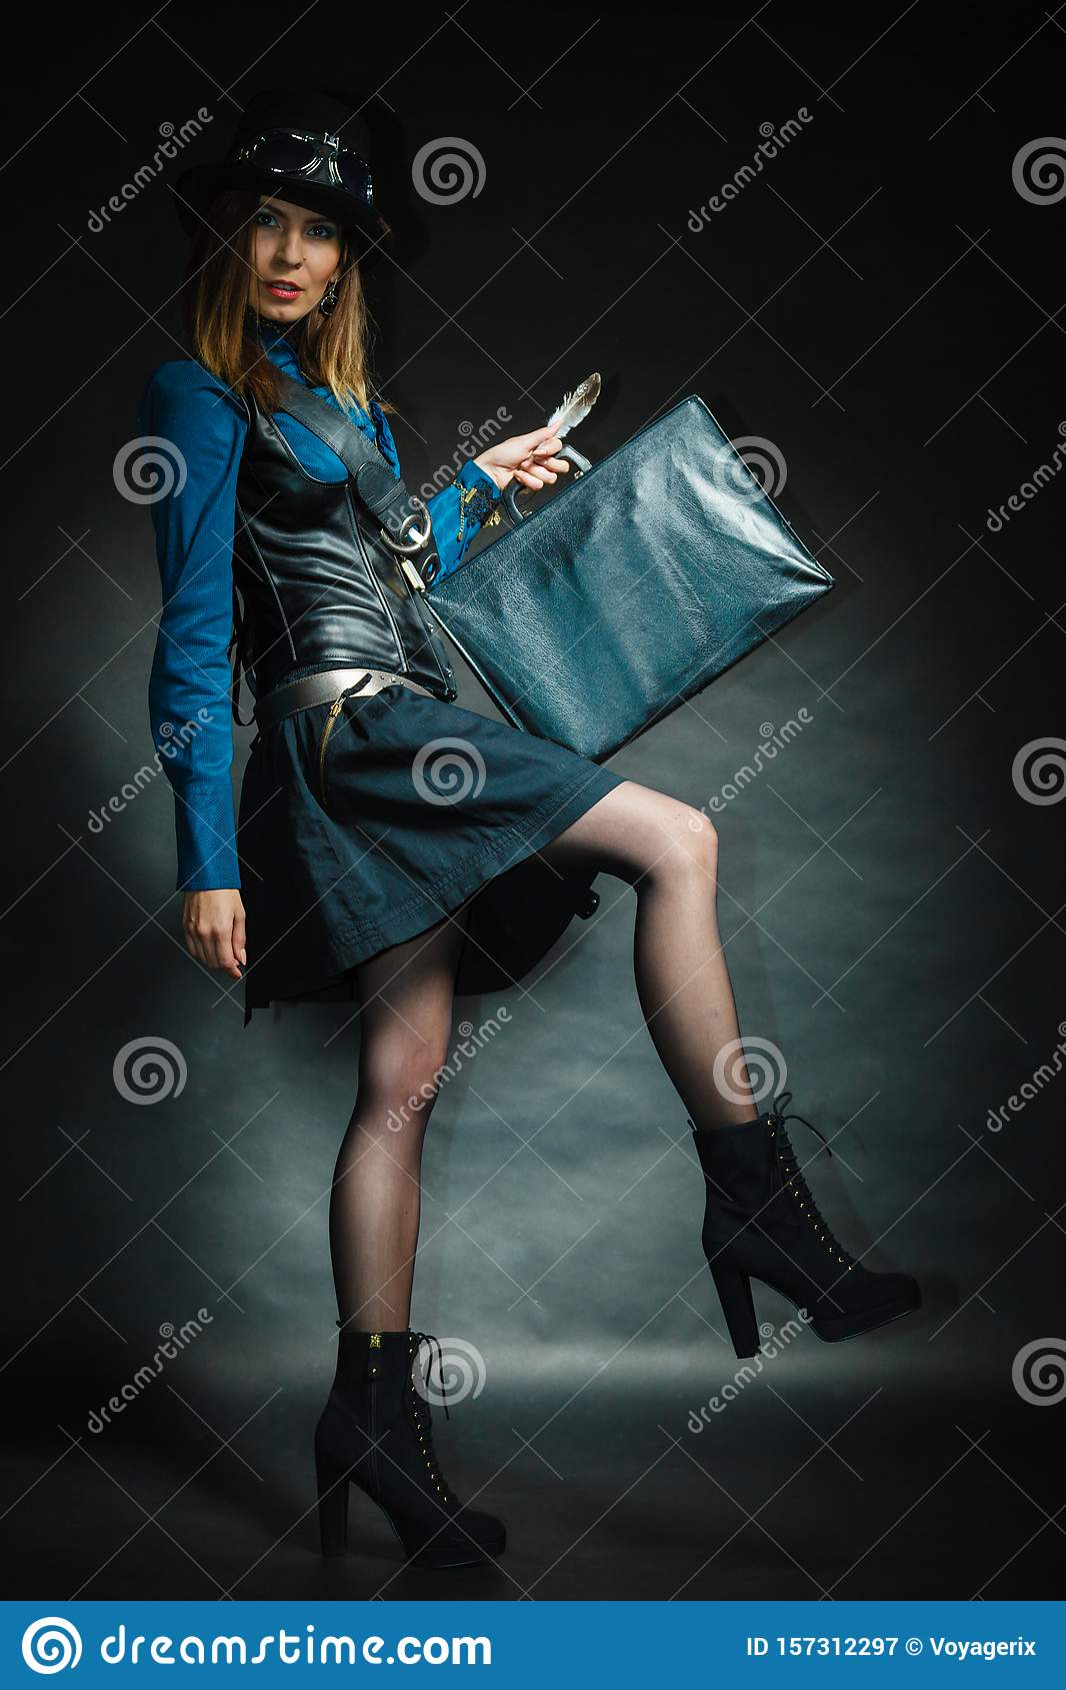 Steampunk girl with retro bag